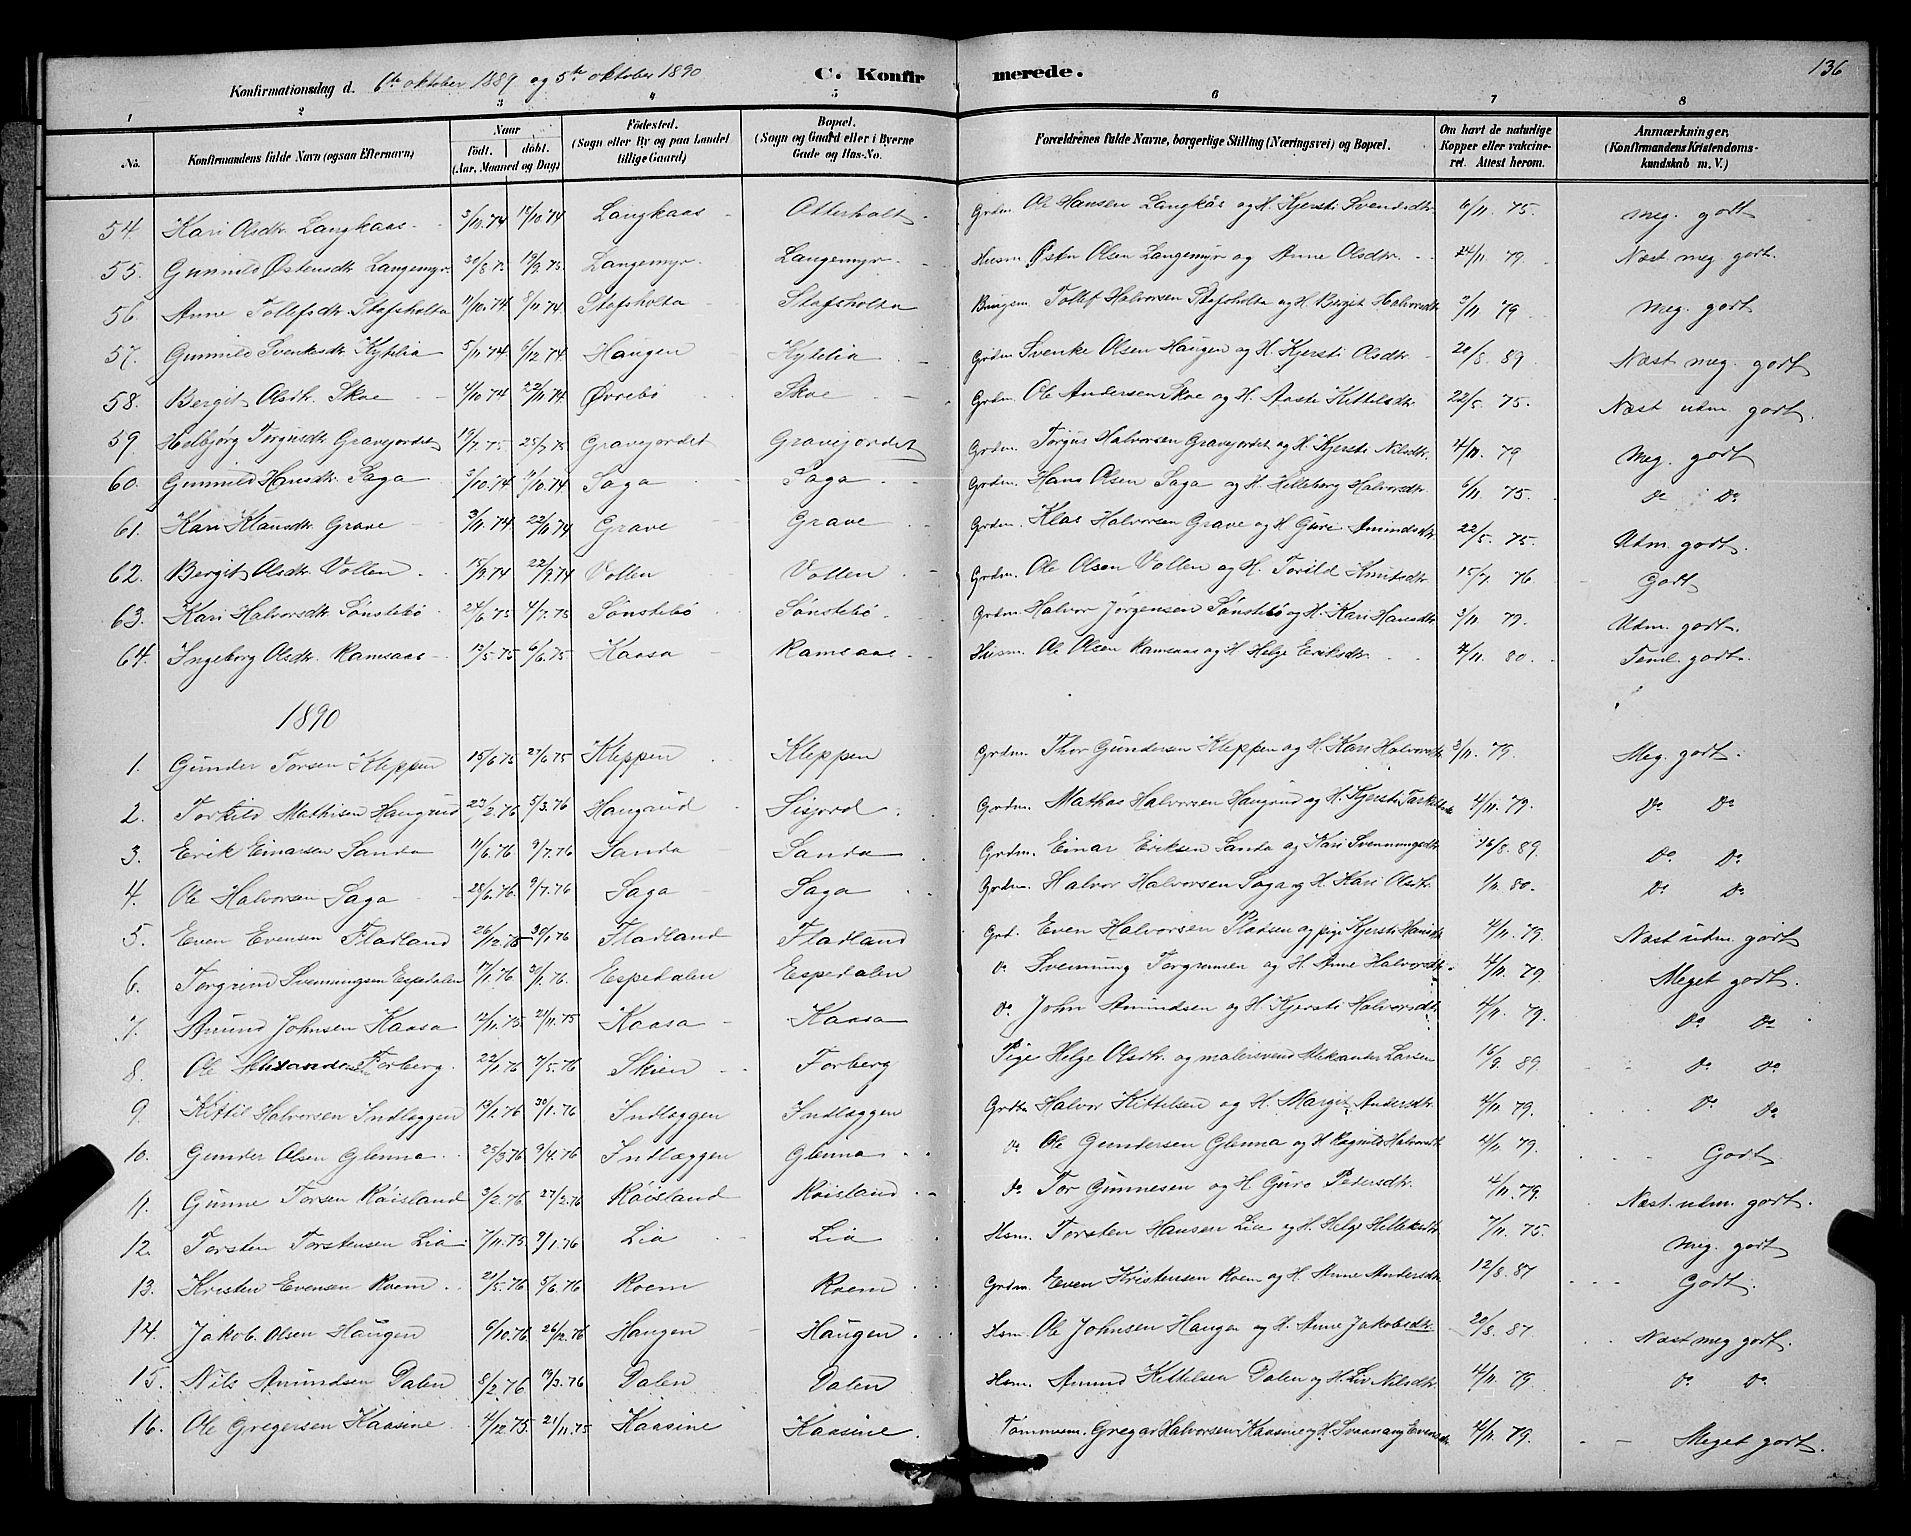 SAKO, Bø kirkebøker, G/Ga/L0005: Klokkerbok nr. 5, 1883-1897, s. 136